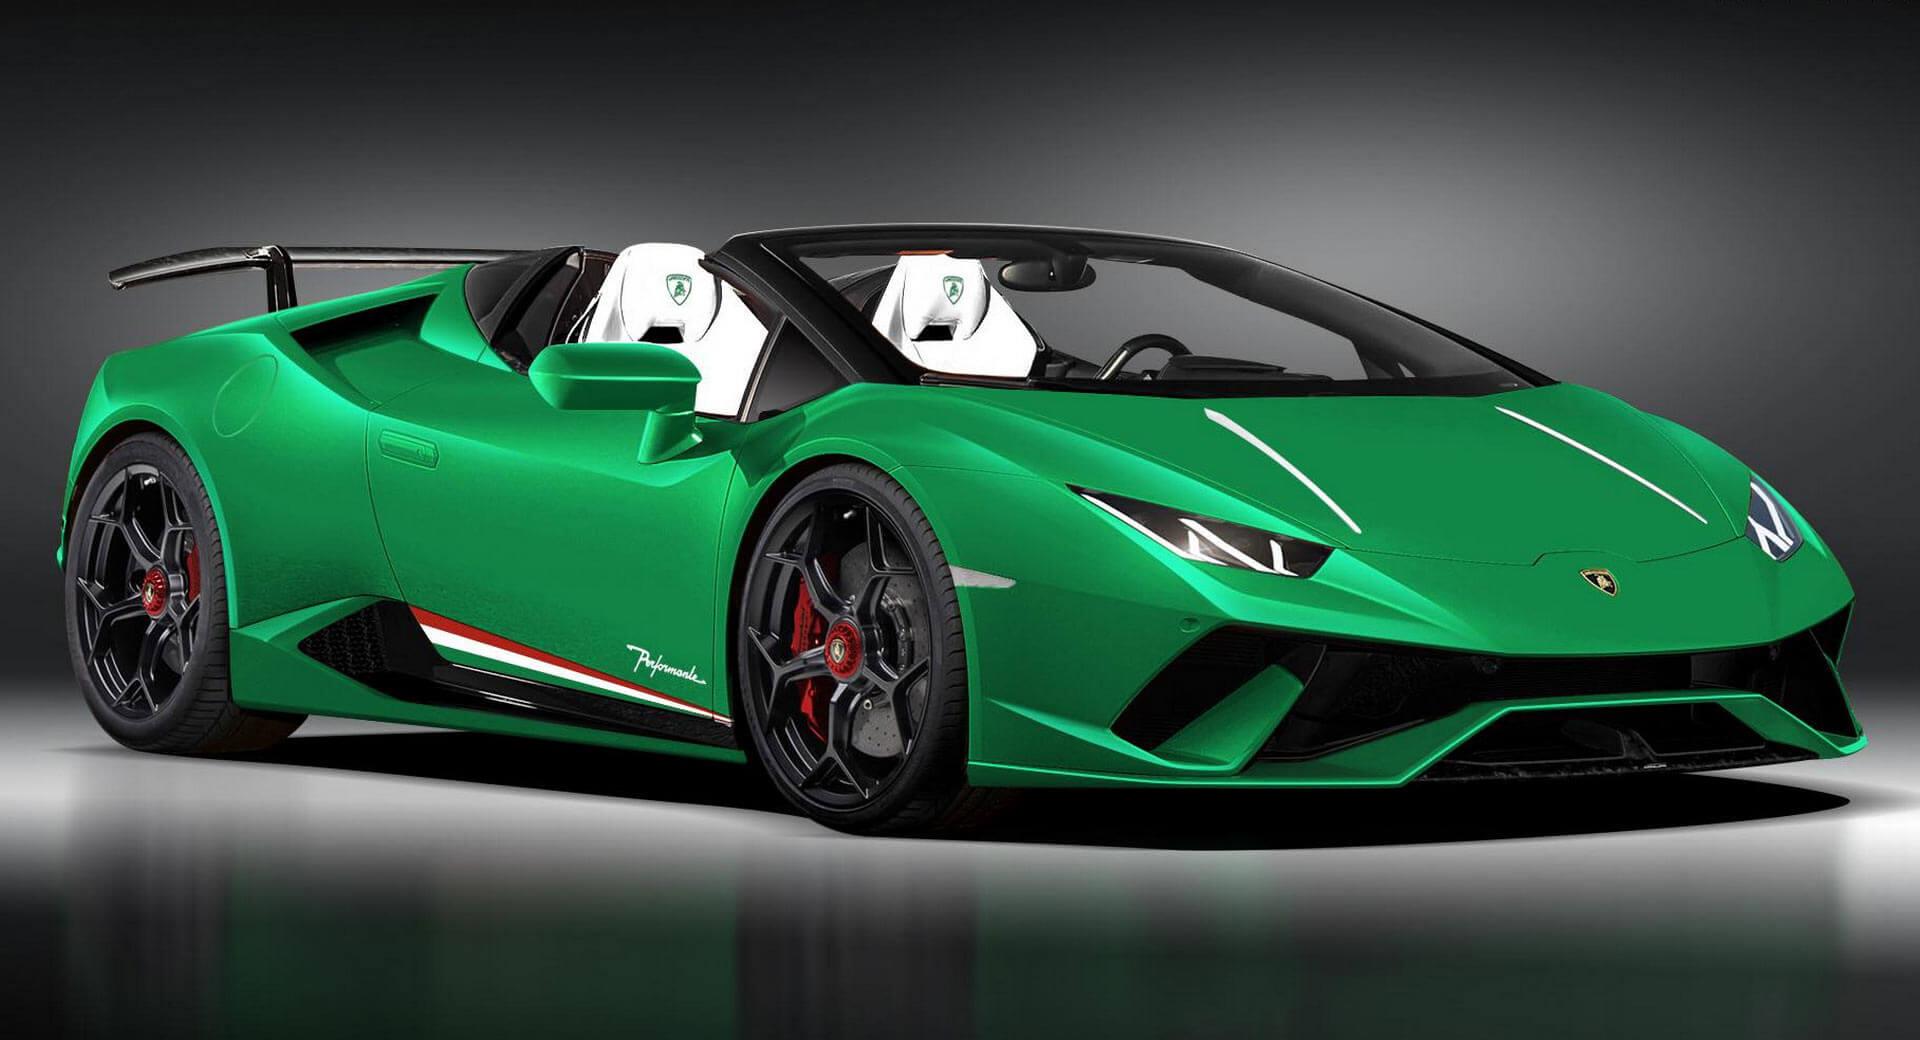 Blue Lamborghini Hd Wallpaper This Lamborghini Huracan Performante Spyder Spec Might